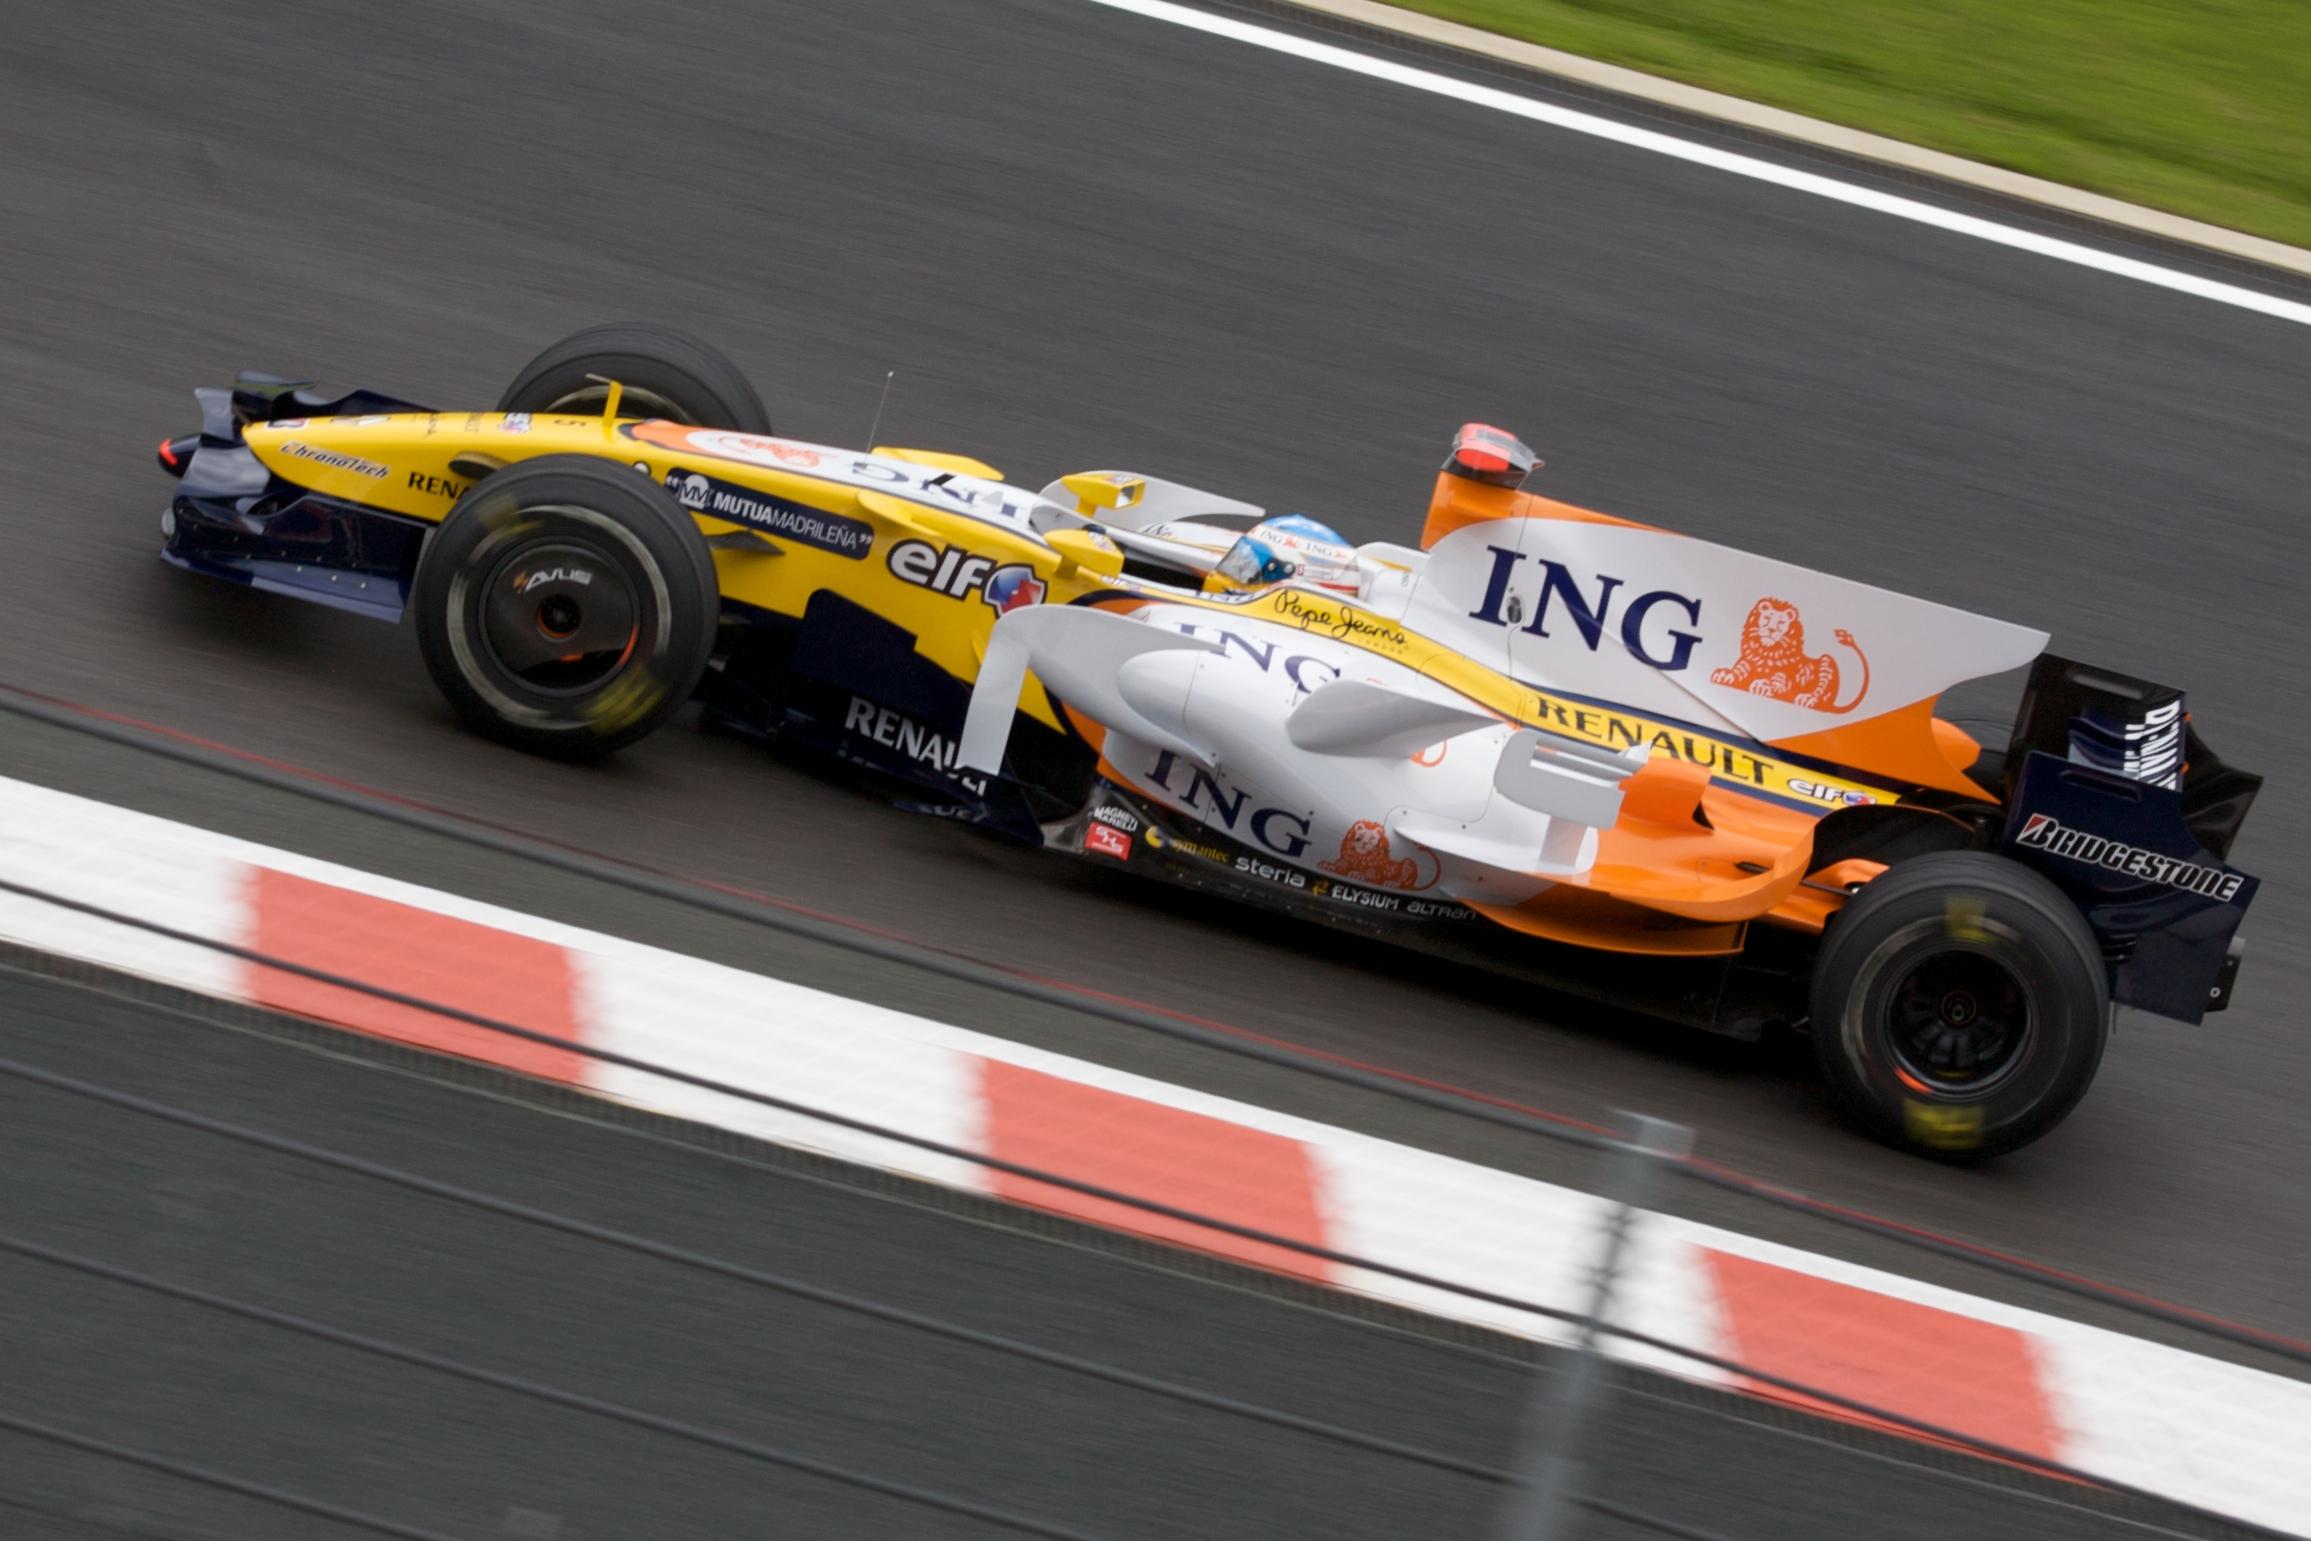 Alonso_Spa_2008.jpg